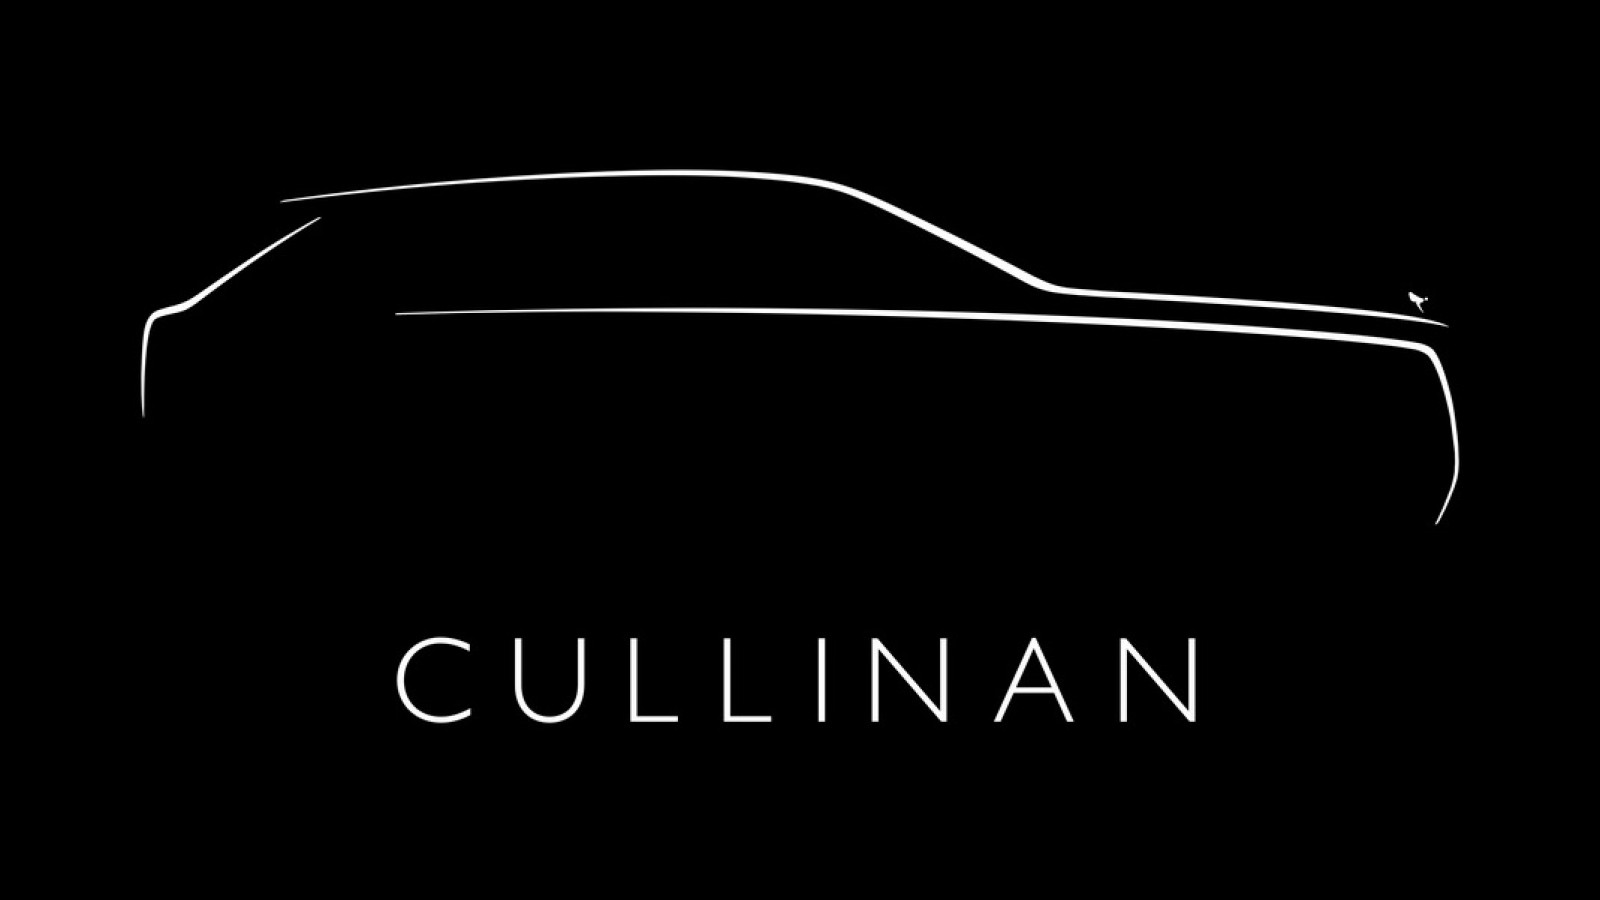 (foto) Oficial: Primul SUV marca Rolls-Royce se va numi Cullinan – Steaua Africii